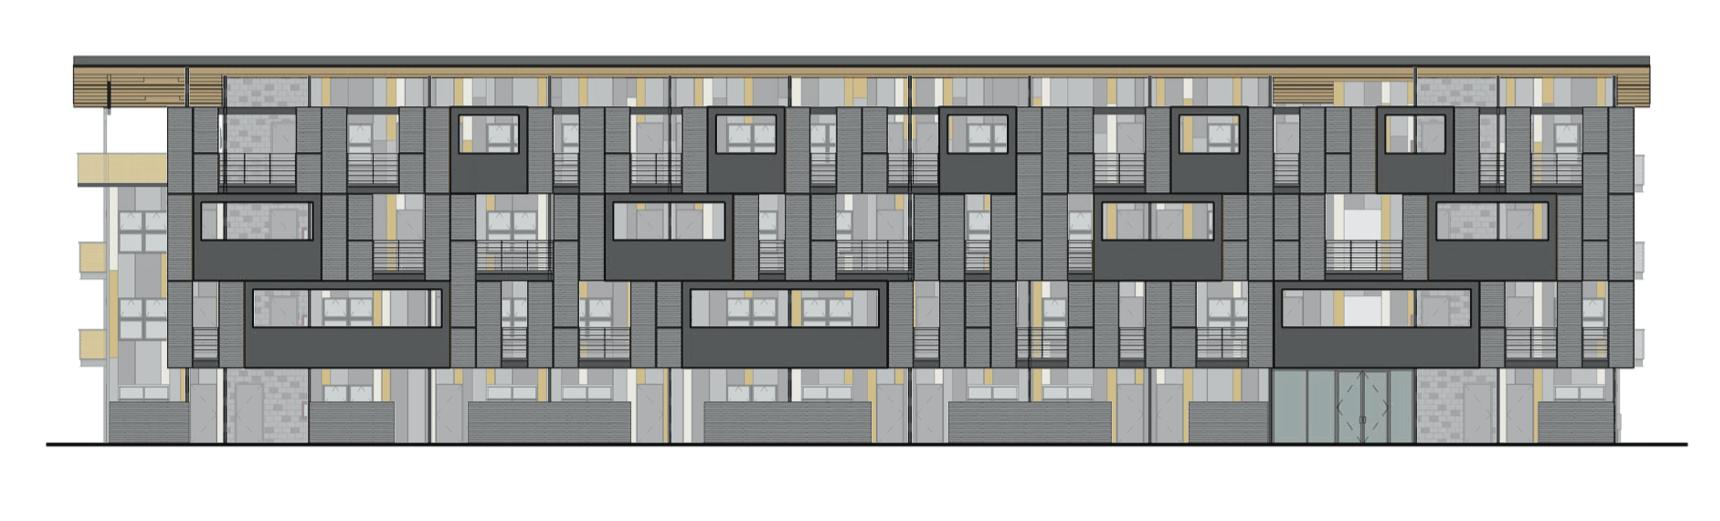 Sunshine portland apartments 3